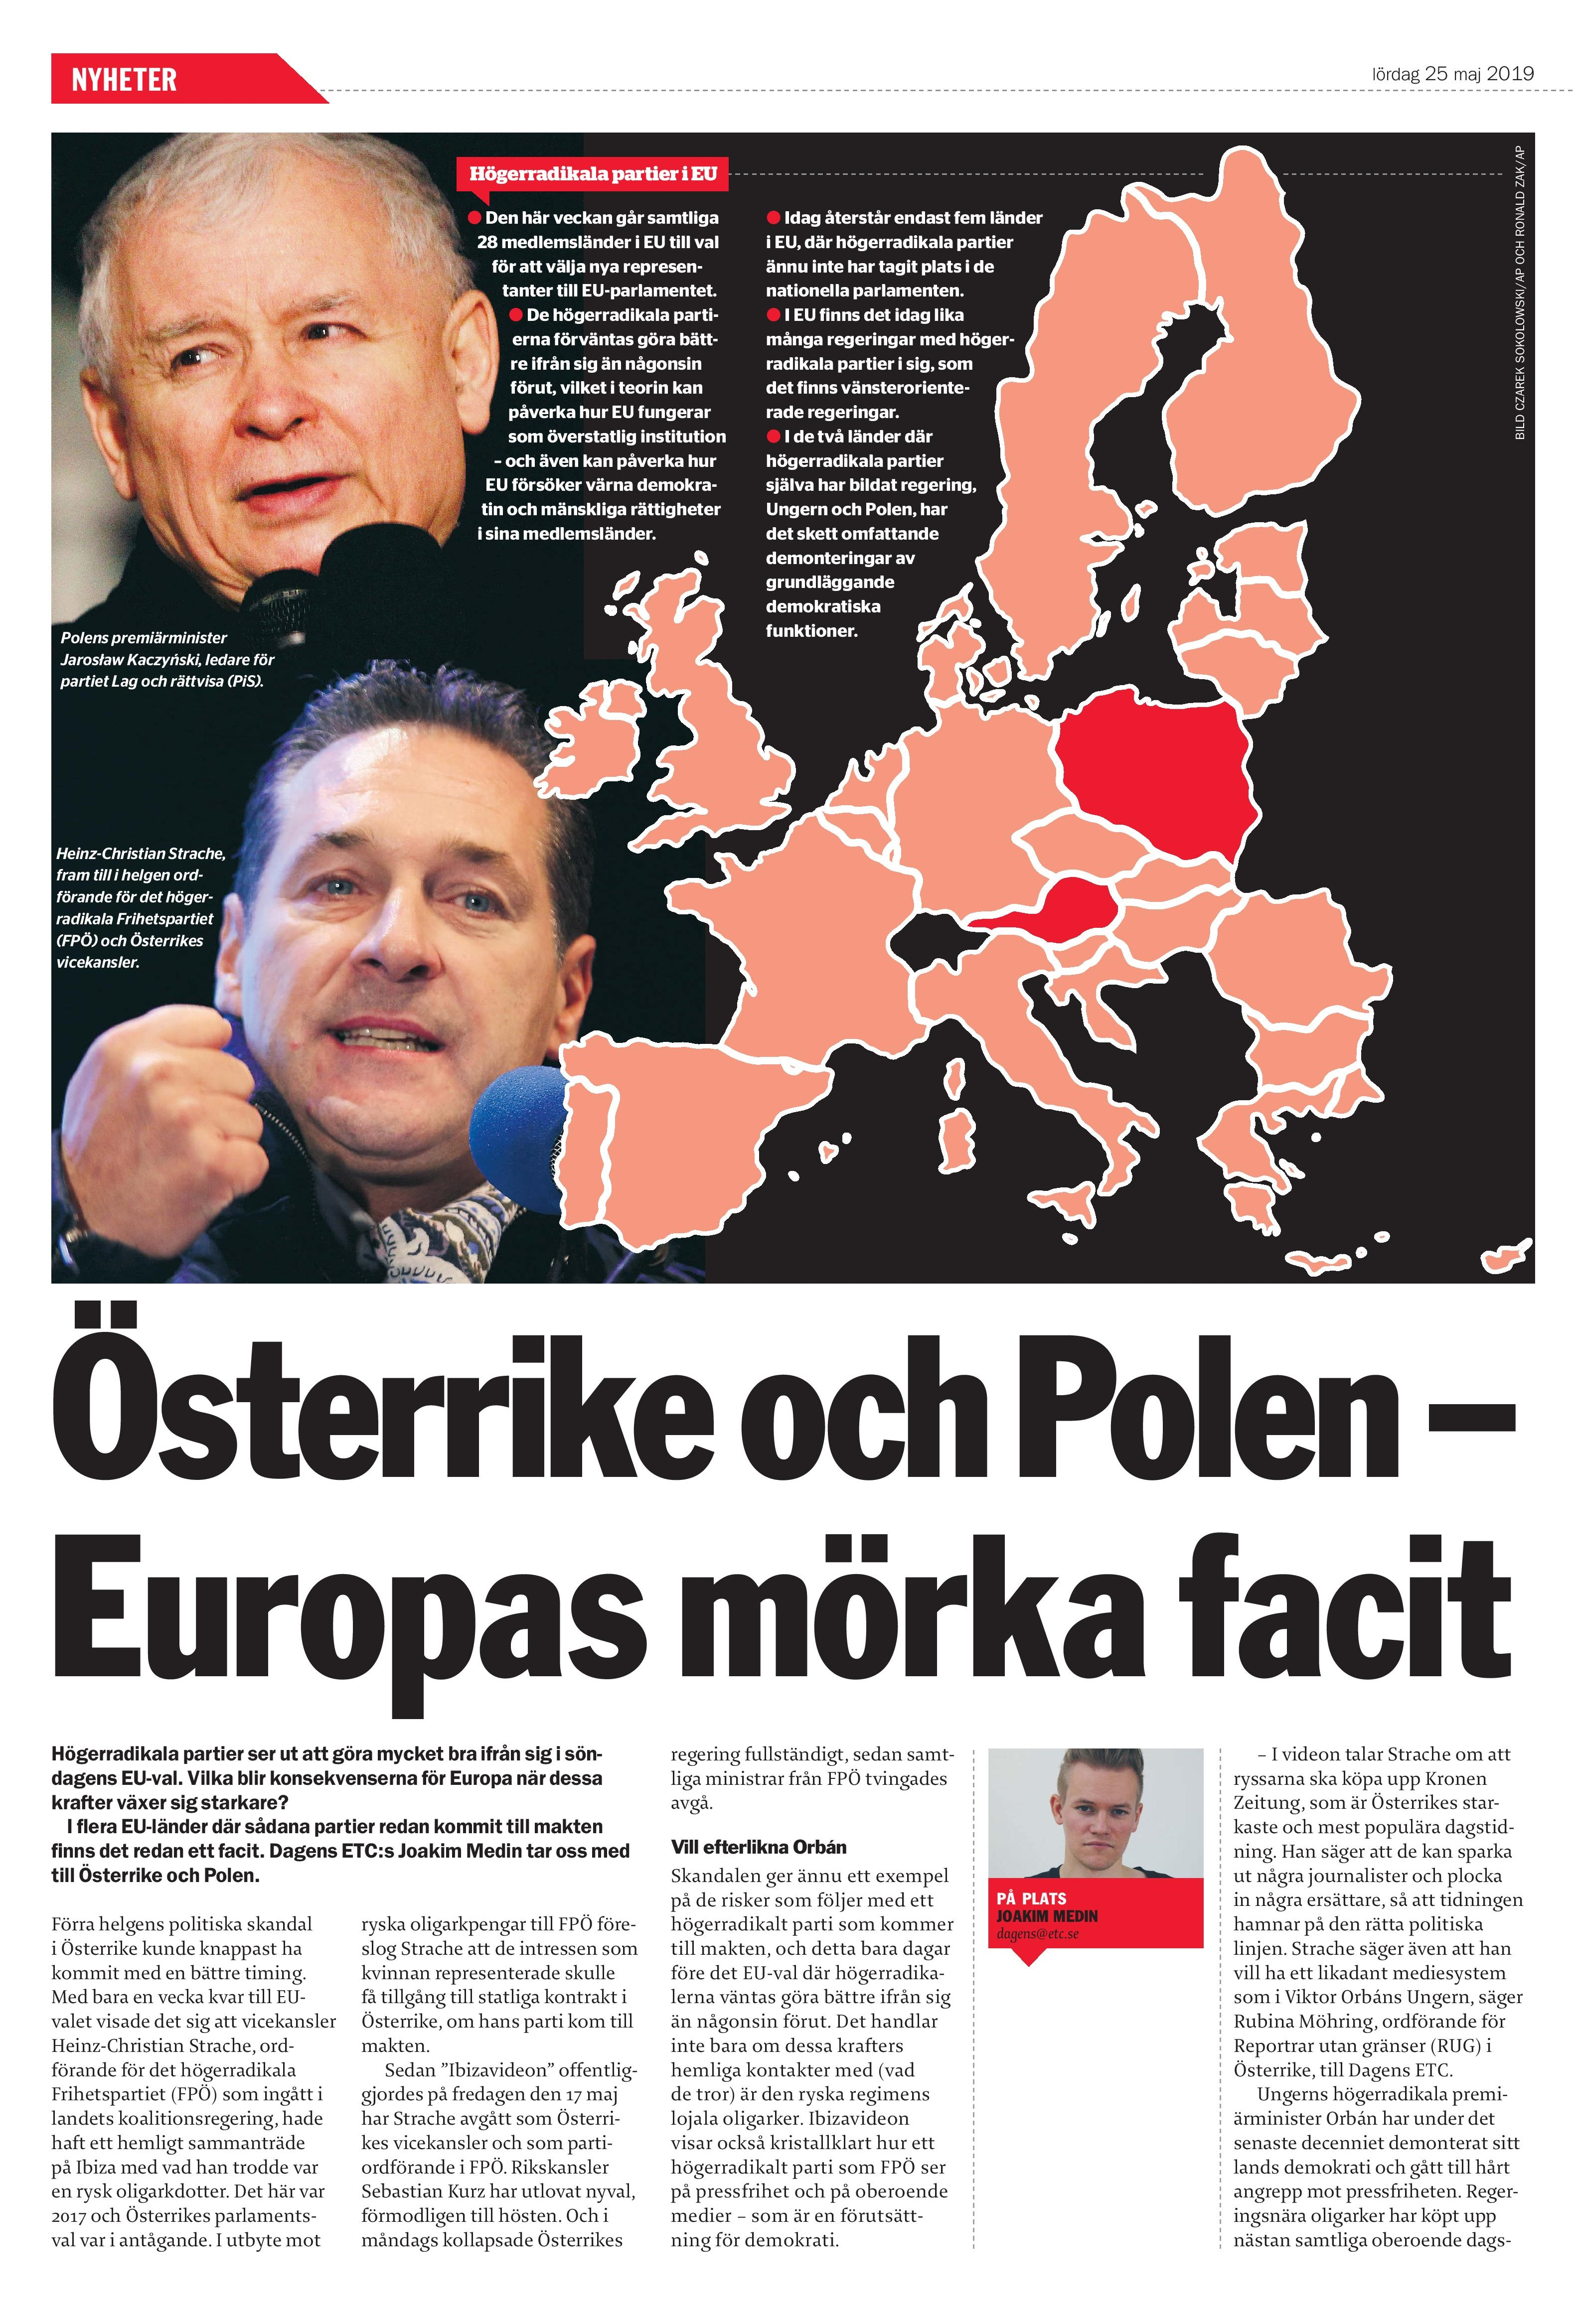 Polen & Österrike, Dagens ETC 2019-05-25